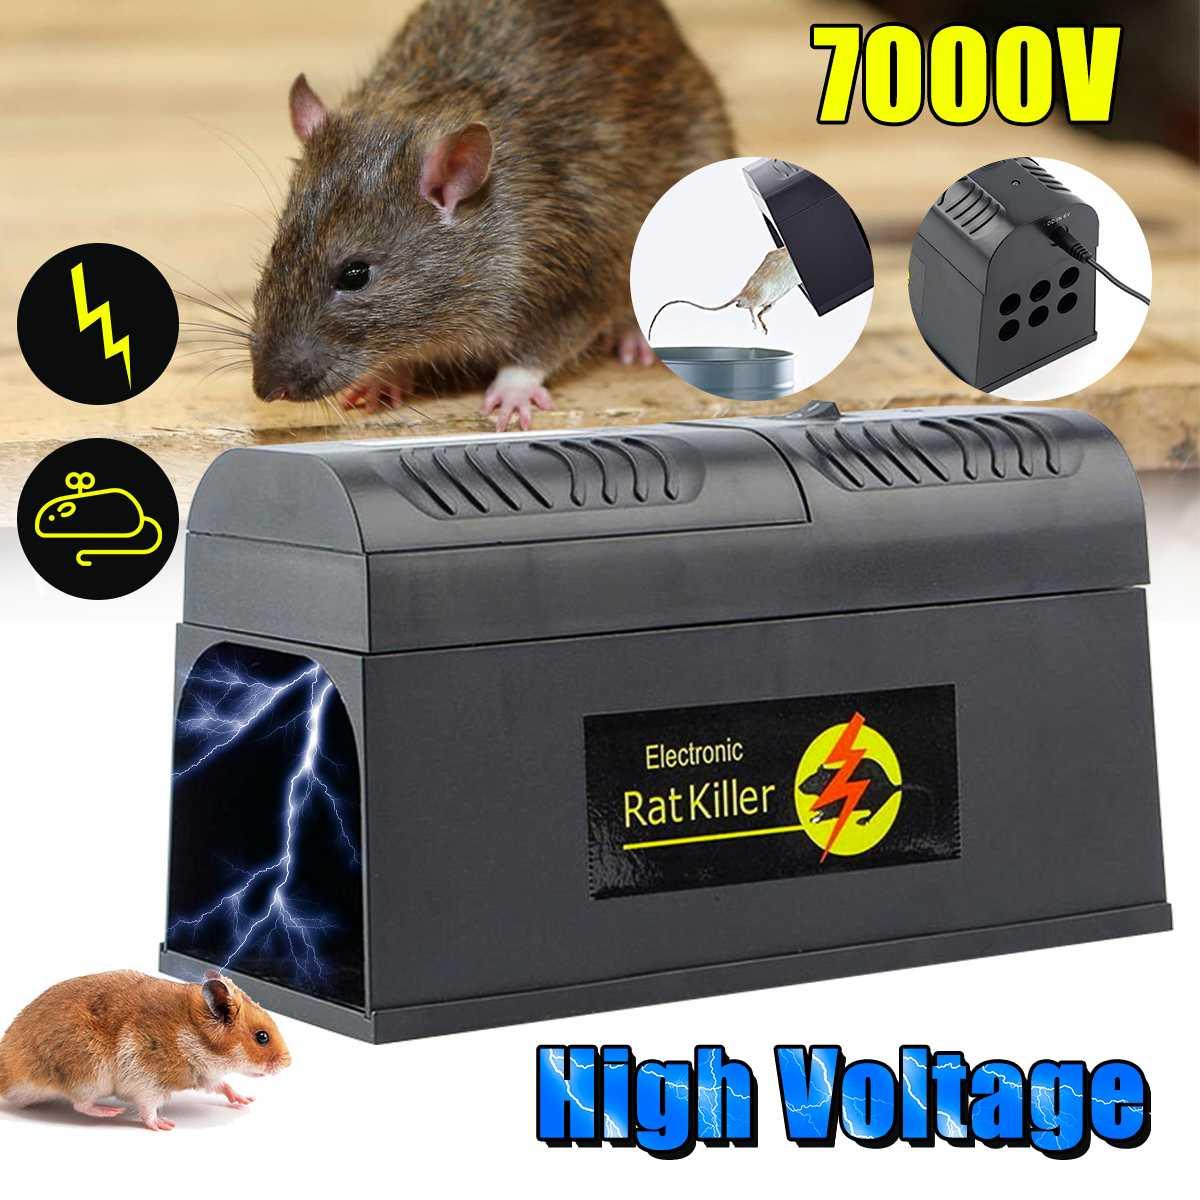 EU/US/UK Plug Electric Mouse Rat Trap Mouse Killer Electronic Rodent Mouse Zapper Trap Humane Rodent Mousetrap Device